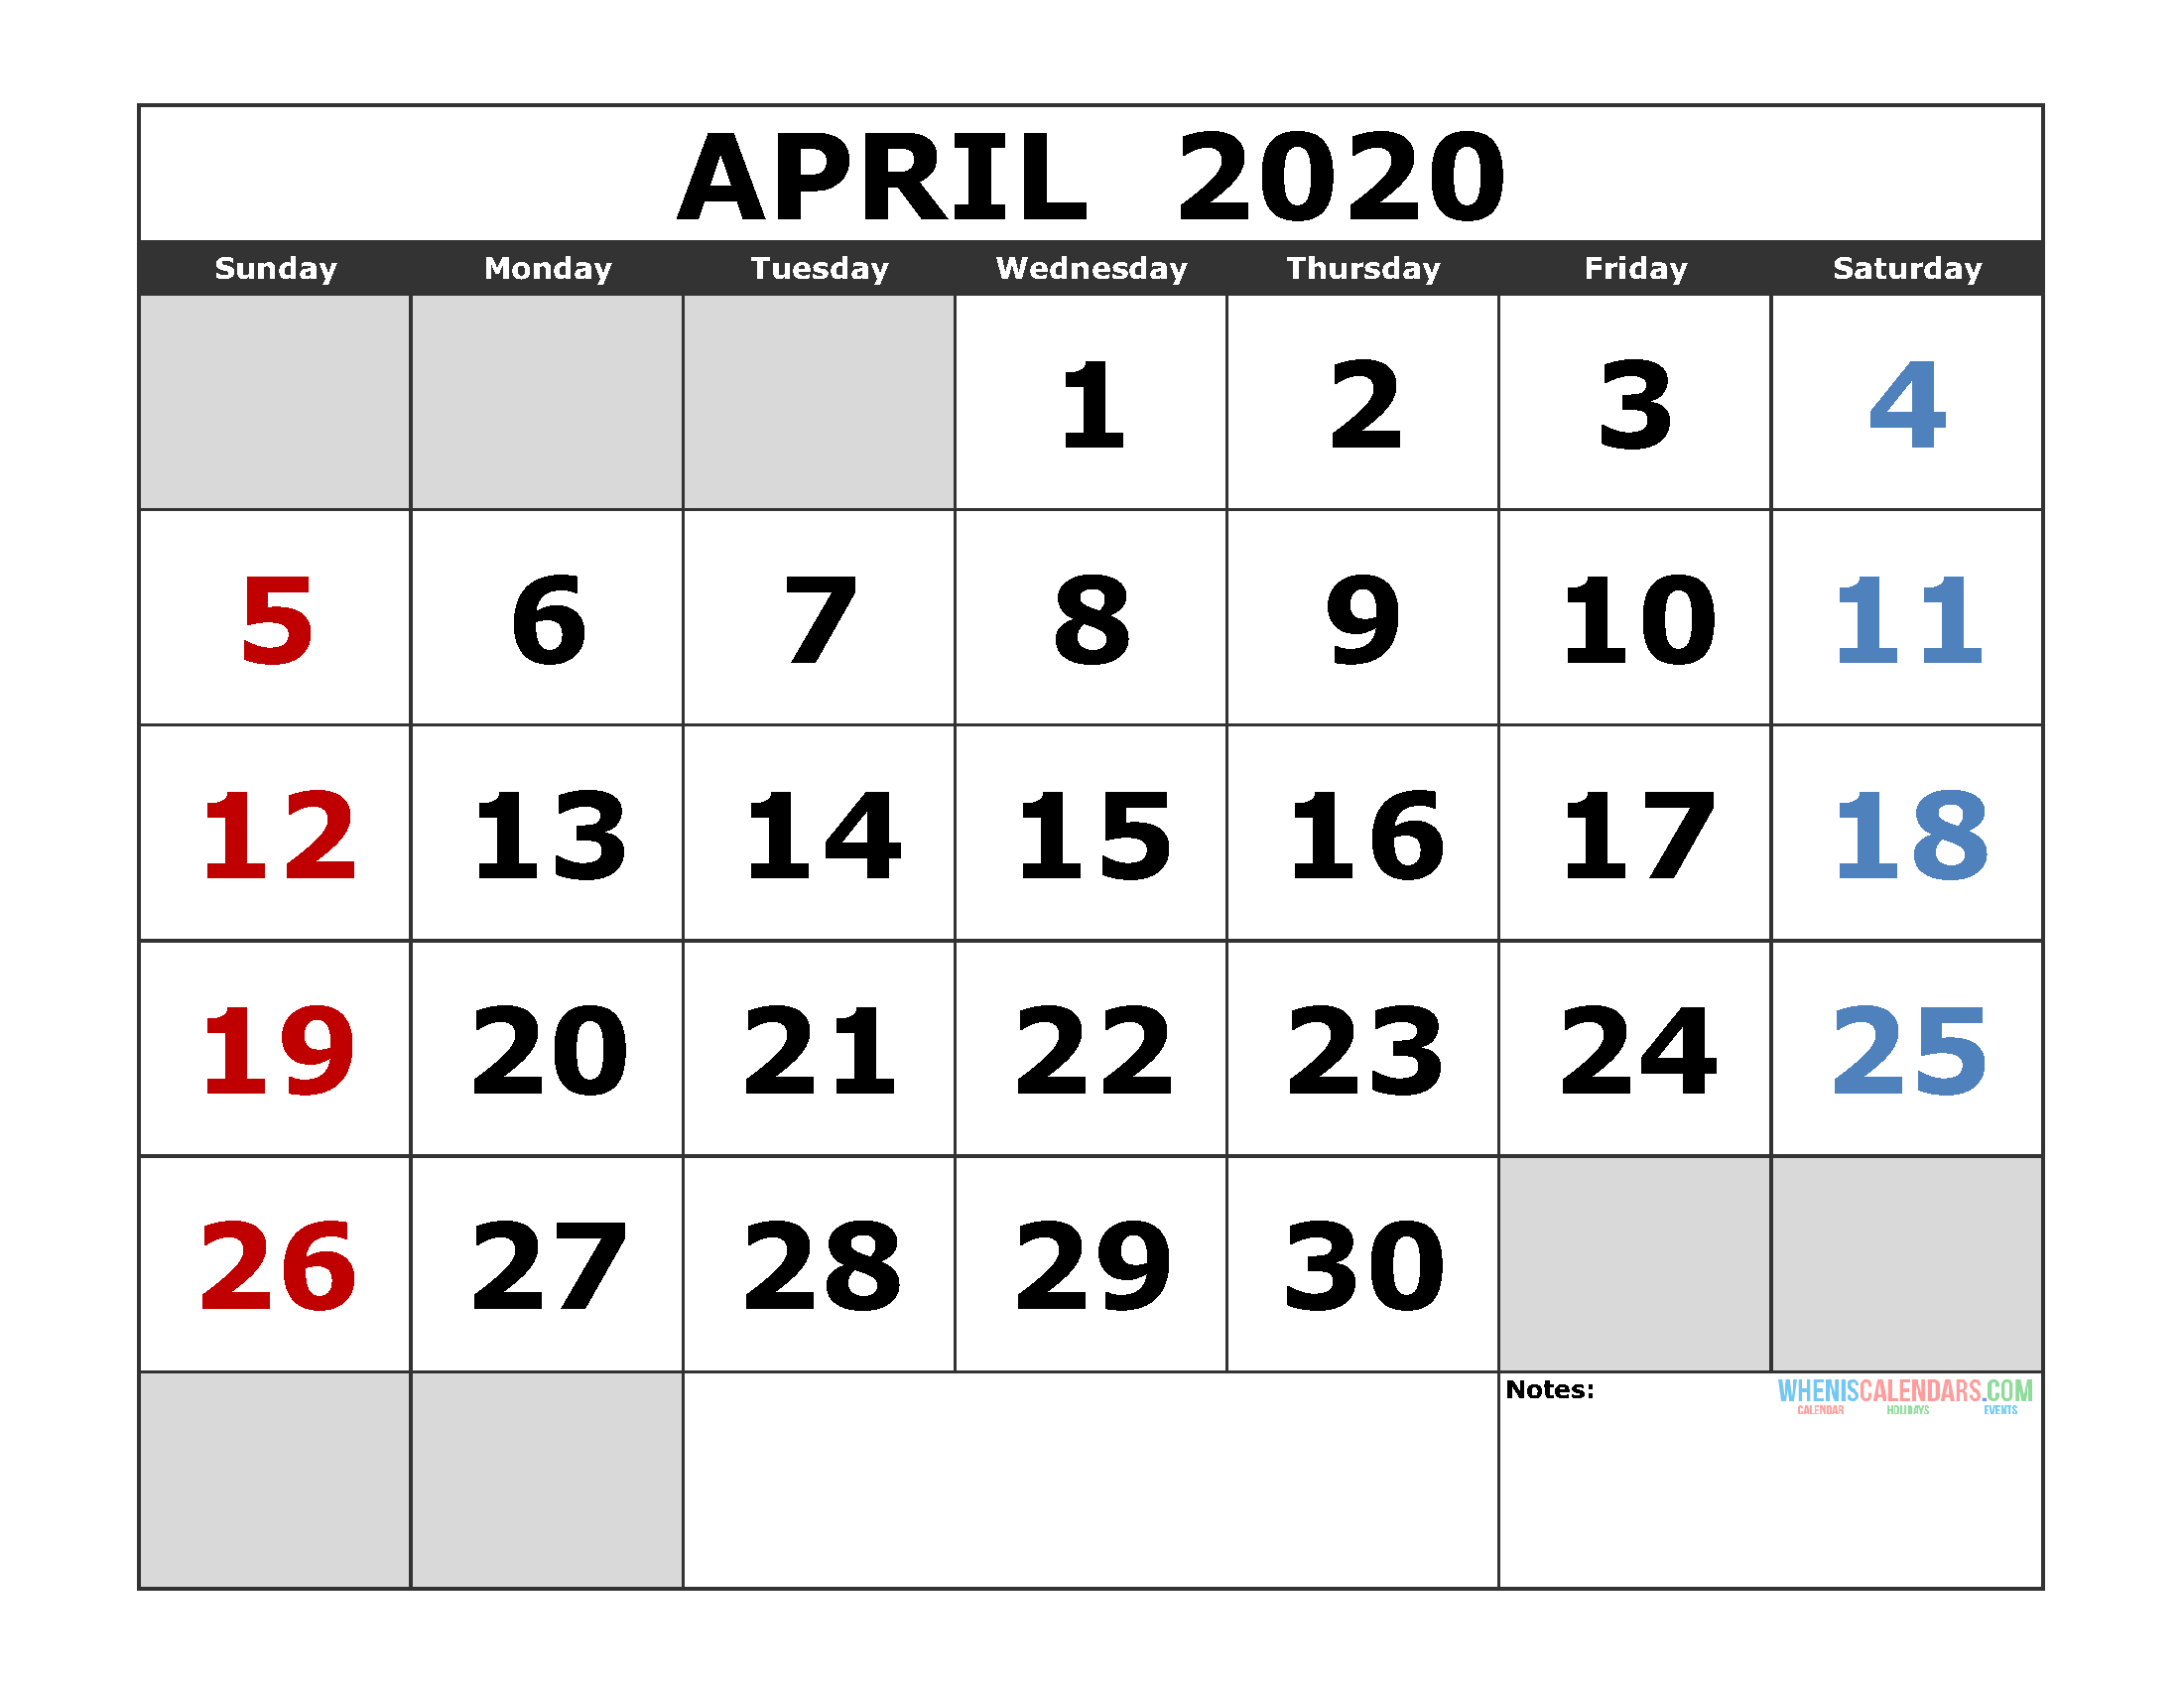 April 2020 Printable Calendar Template Excel, Pdf, Image Image Of Month Calendar